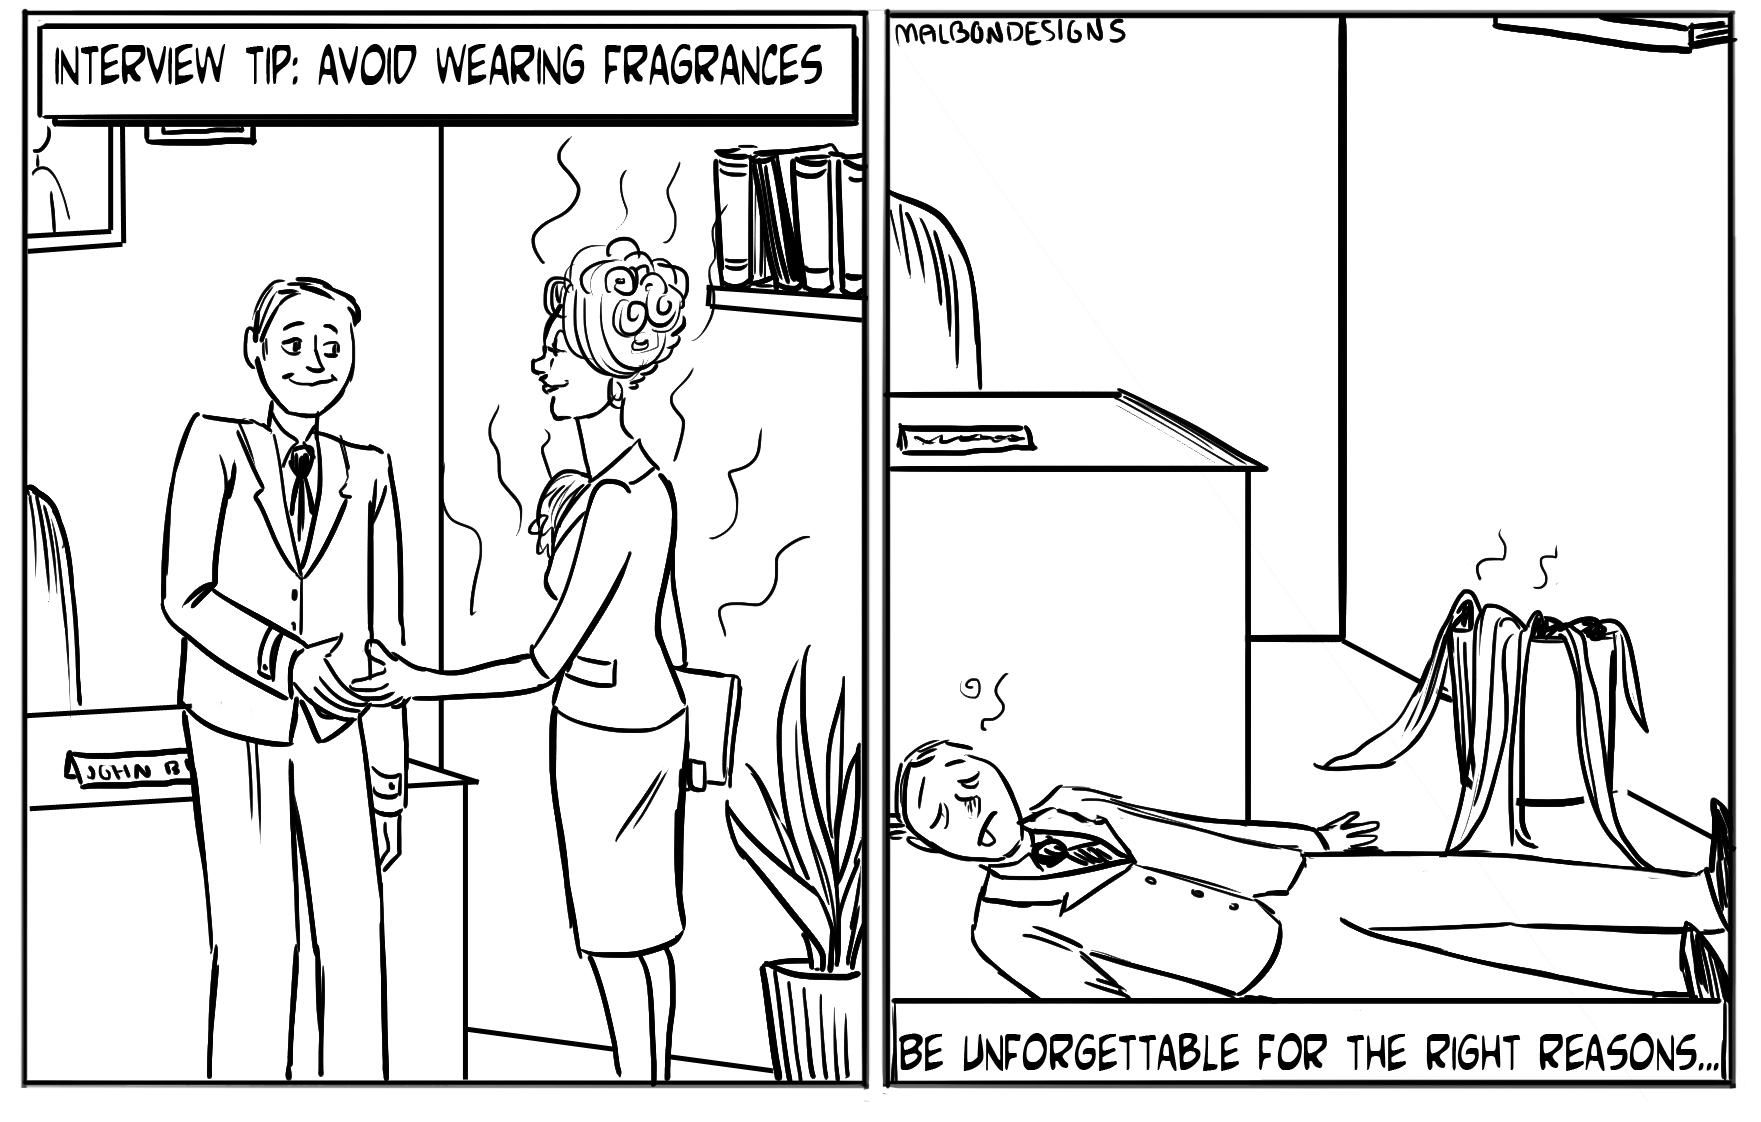 Avoid Fragrances